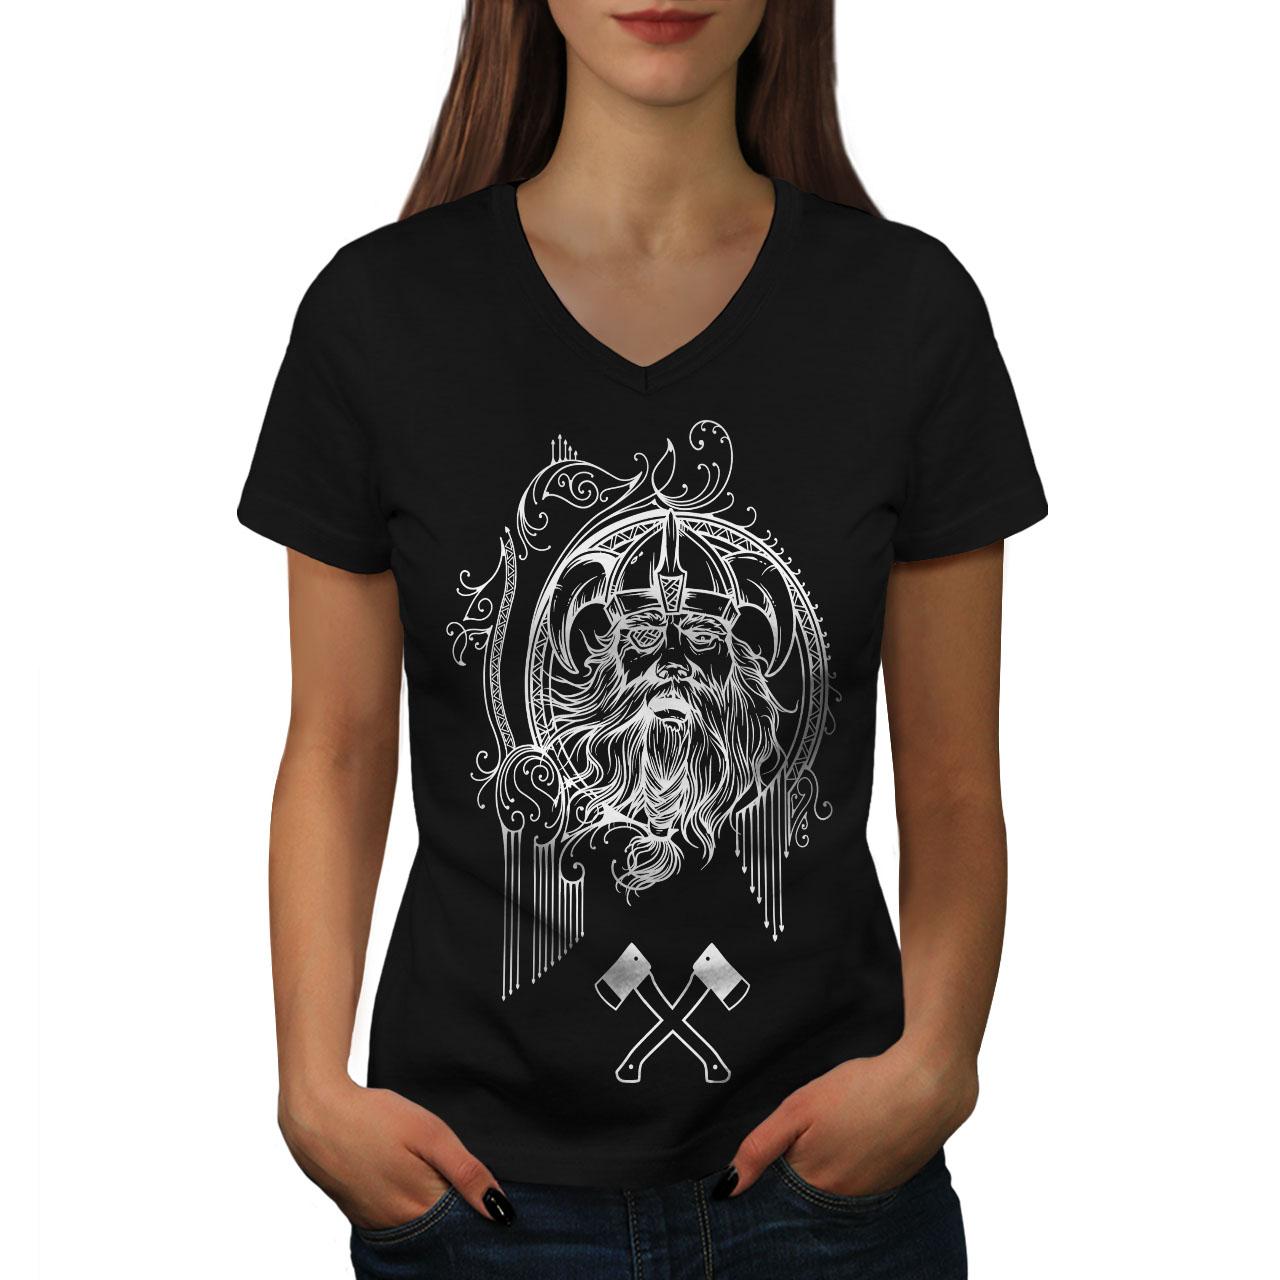 Wellcoda-North-Face-Guerrier-Femme-T-Shirt-col-V-Bataille-de-conception-graphique-Tee miniature 3